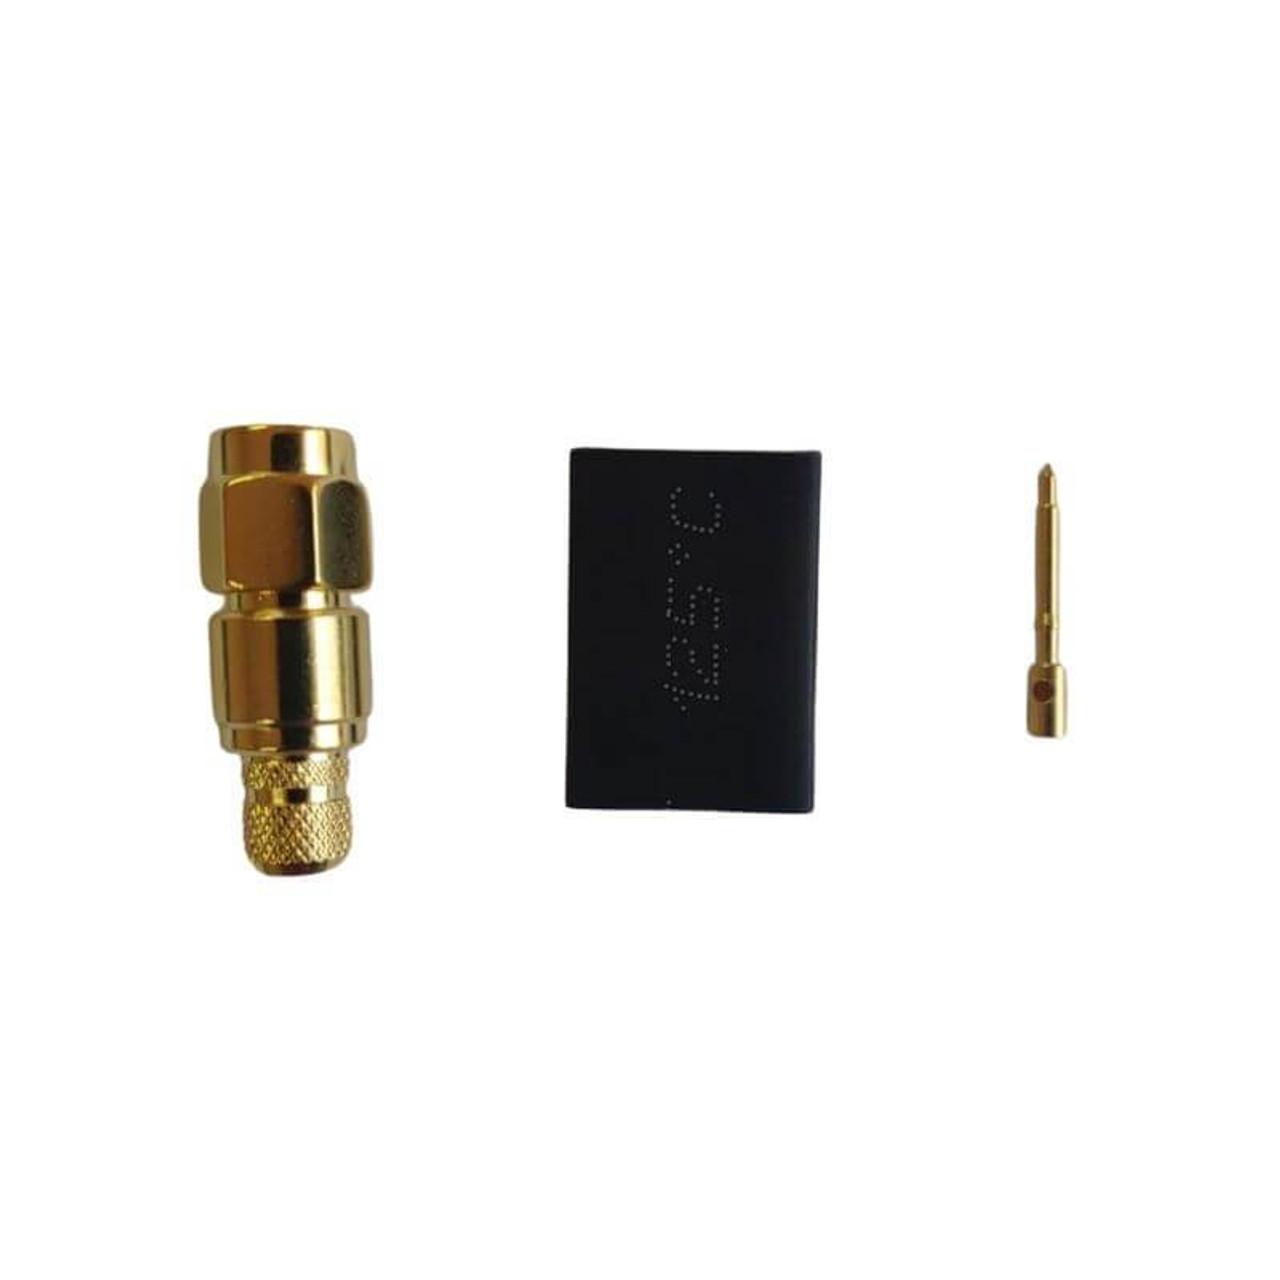 Bolton Crimp Connector SMA-Male for Bolton 240 or LMR240®